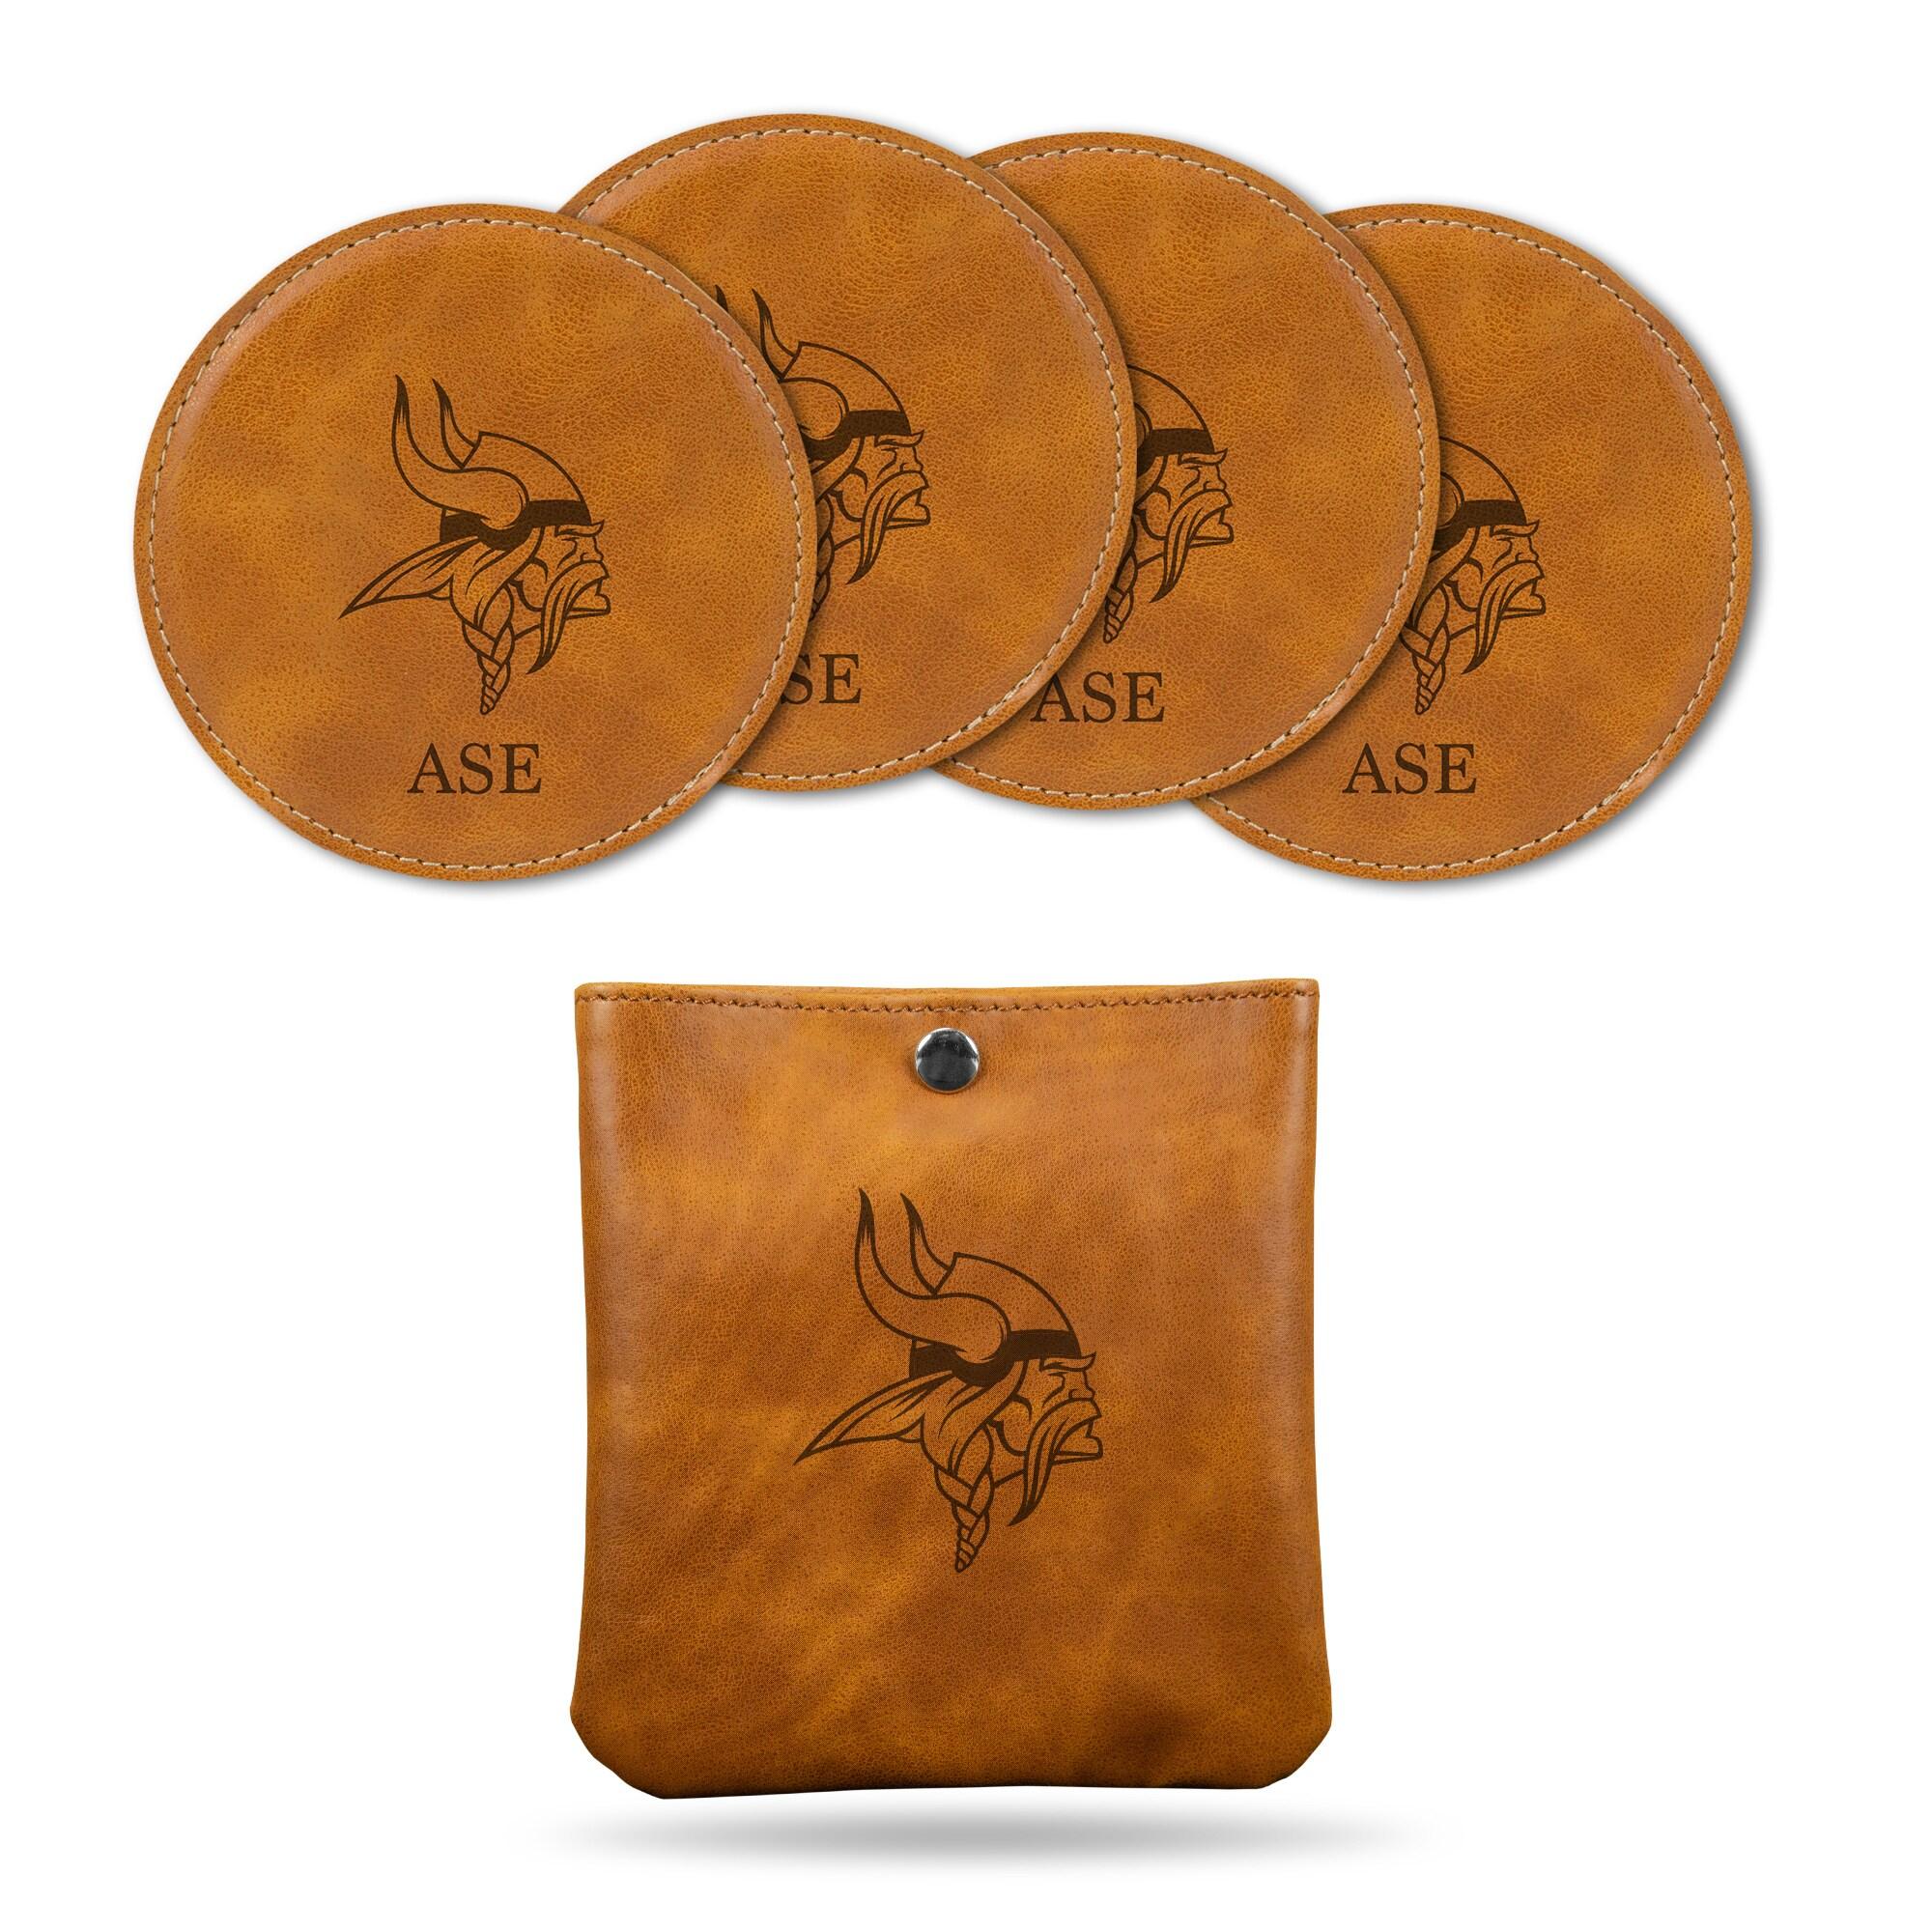 Minnesota Vikings Sparo 4-Pack Personalized Coaster Set - Brown